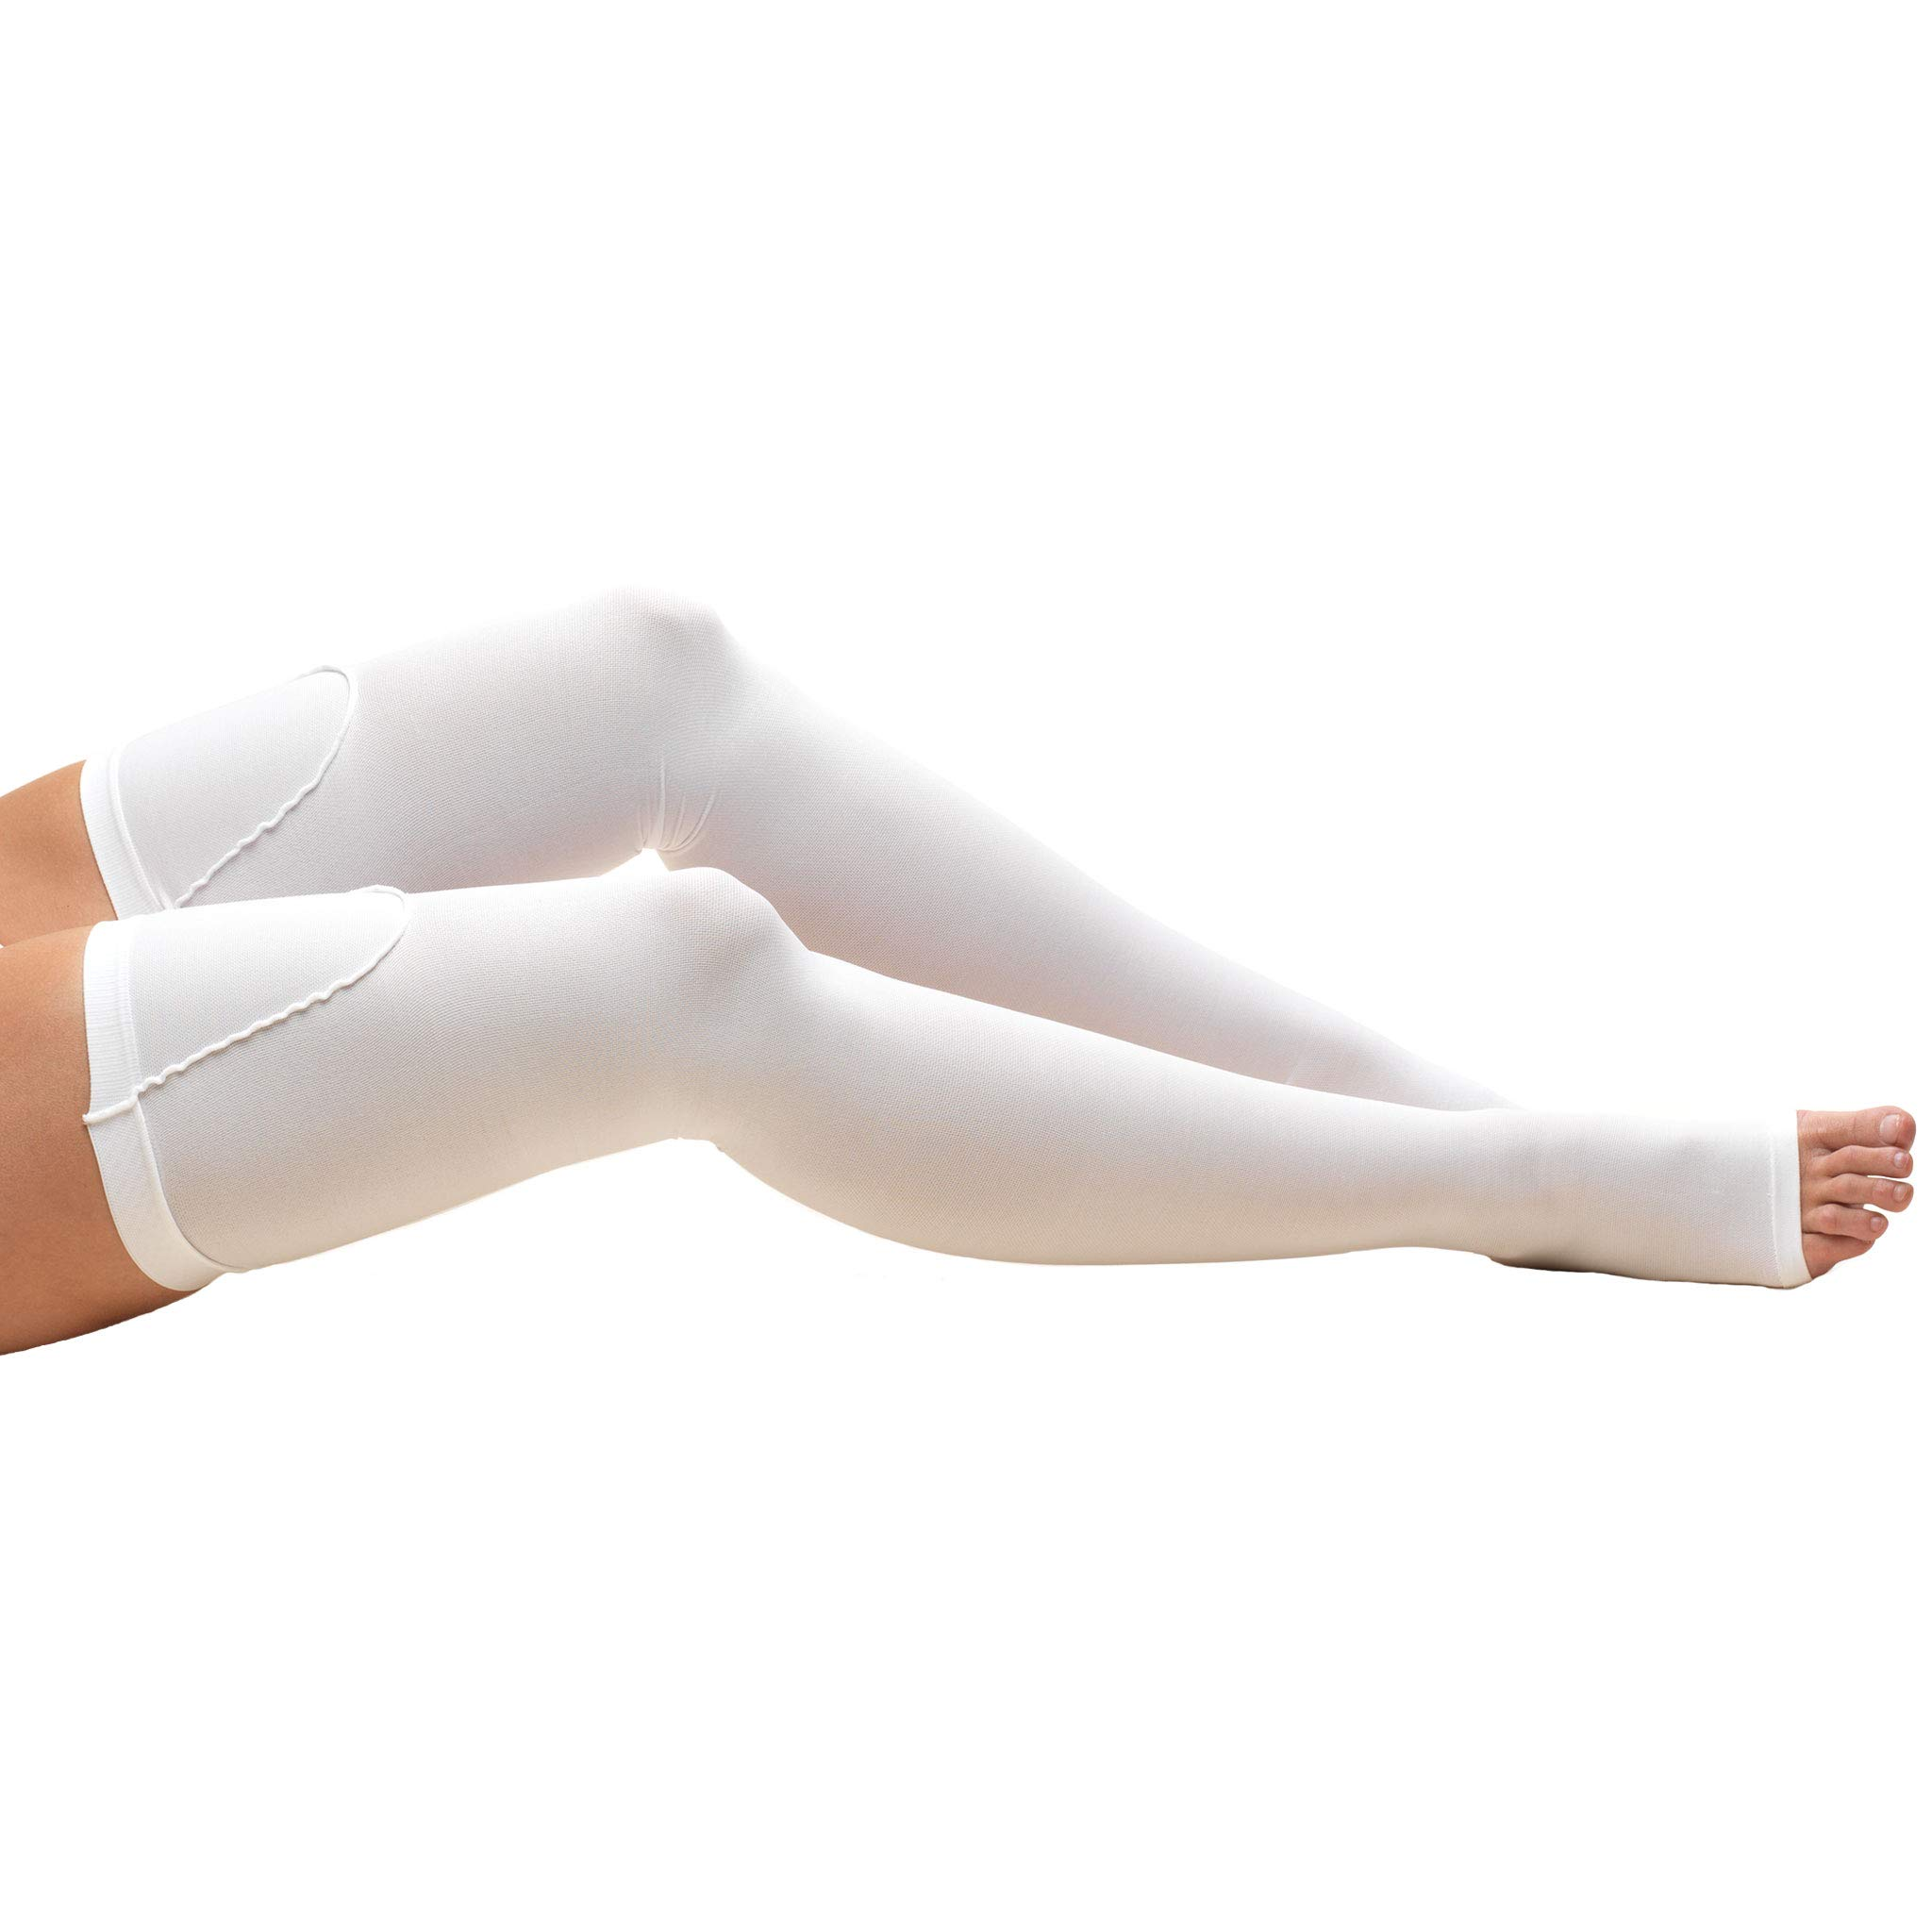 f3a93bee701 Amazon.com  Truform Surgical Stockings